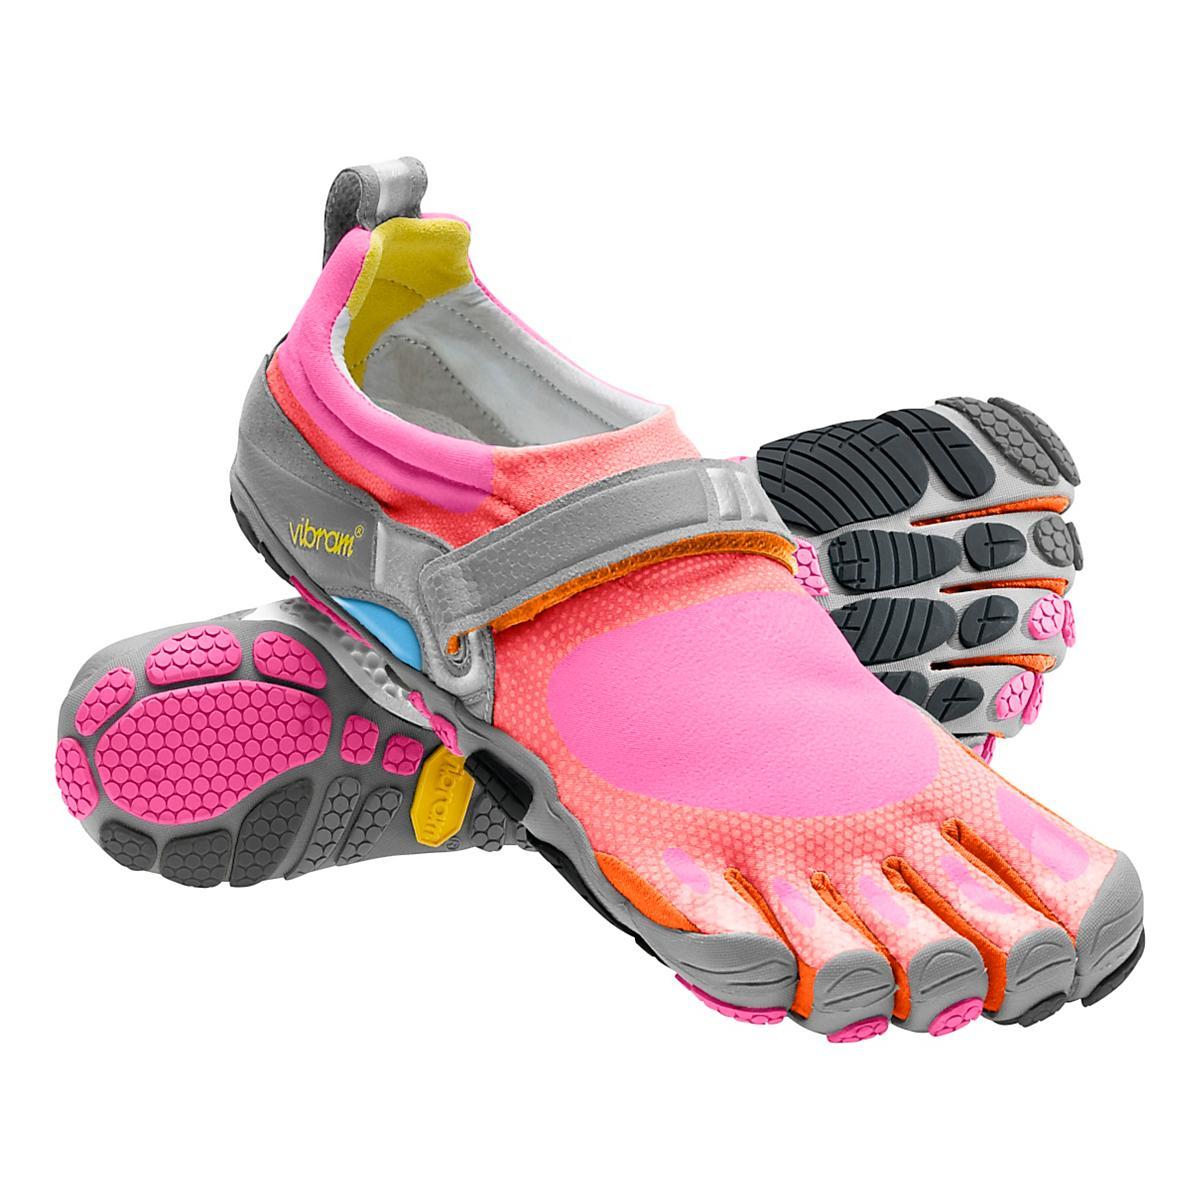 Womens Vibram FiveFingers Bikila Running Shoe at Road Runner Sports 0f69287f10